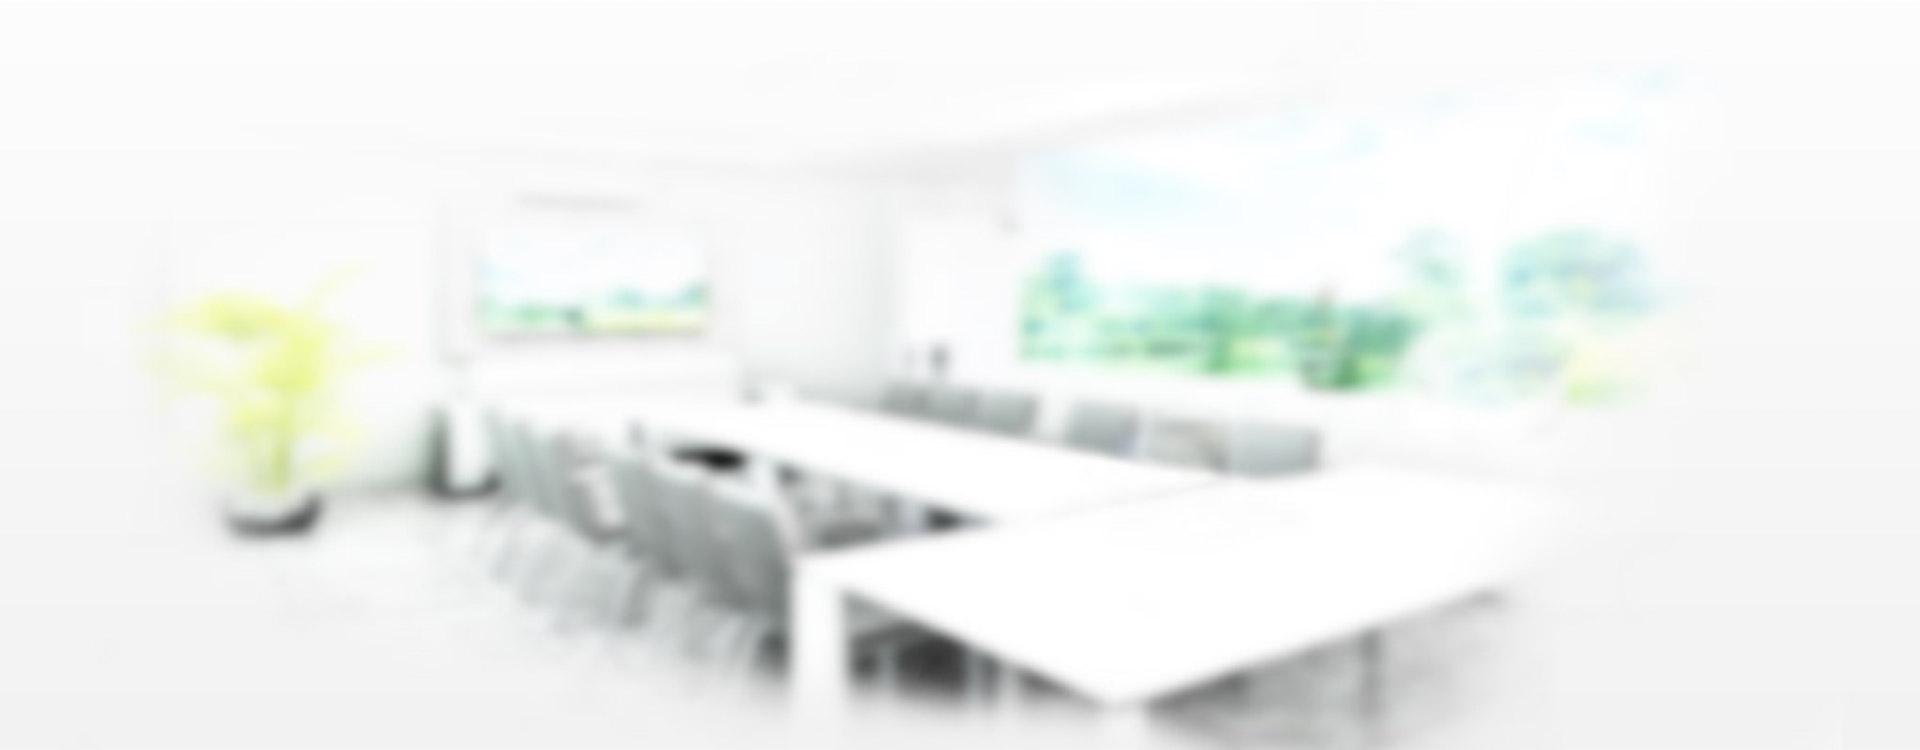 Seo Services Digital Marketing Company In Orange County 1 Rated Digital Marketing Company And Web Design Agency